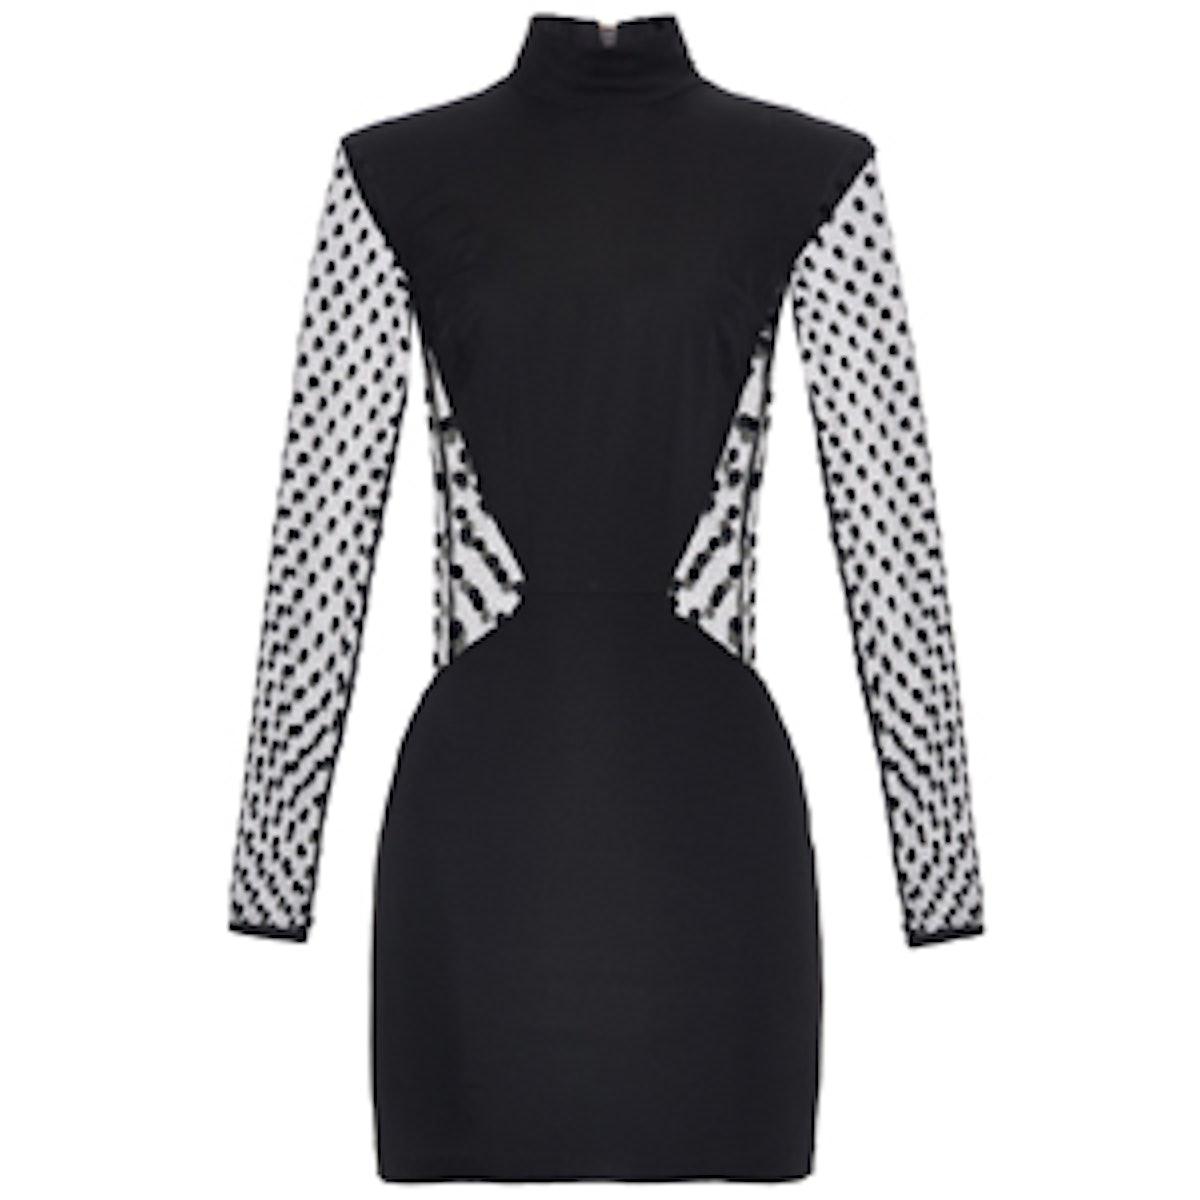 Long-Sleeved Polka-Dot Mini Dress